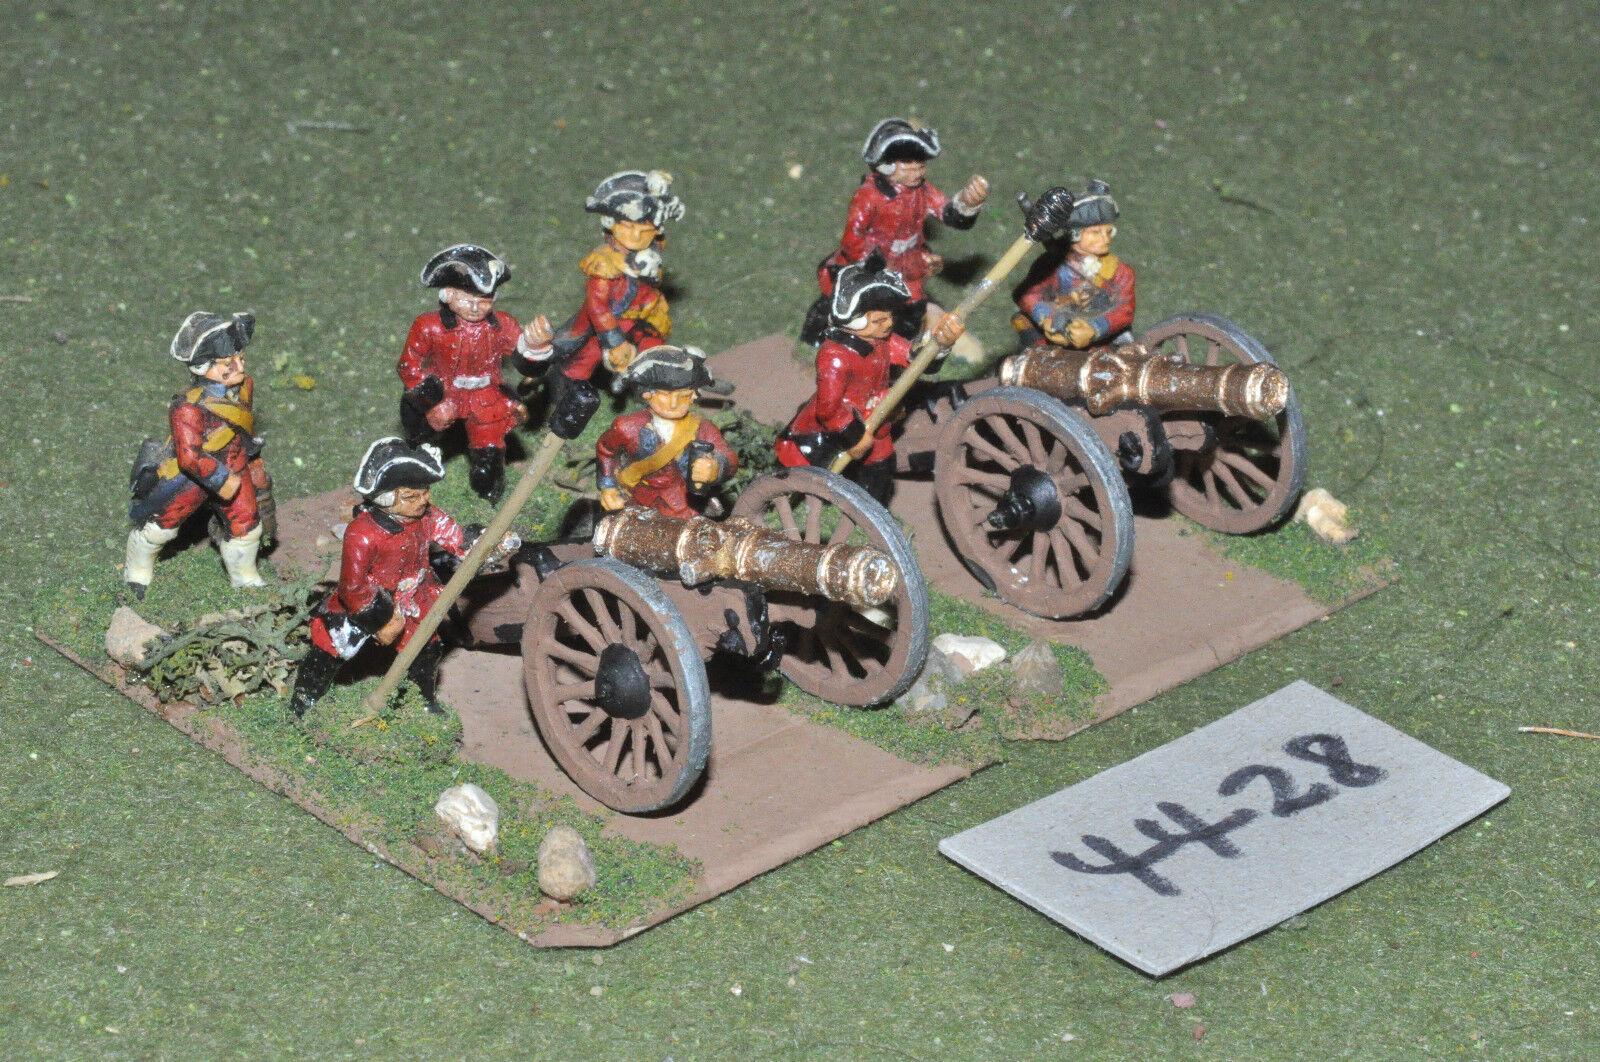 25mm marlburian francés artillería 2 cañones & Crew de metal pintado-arte (4428)